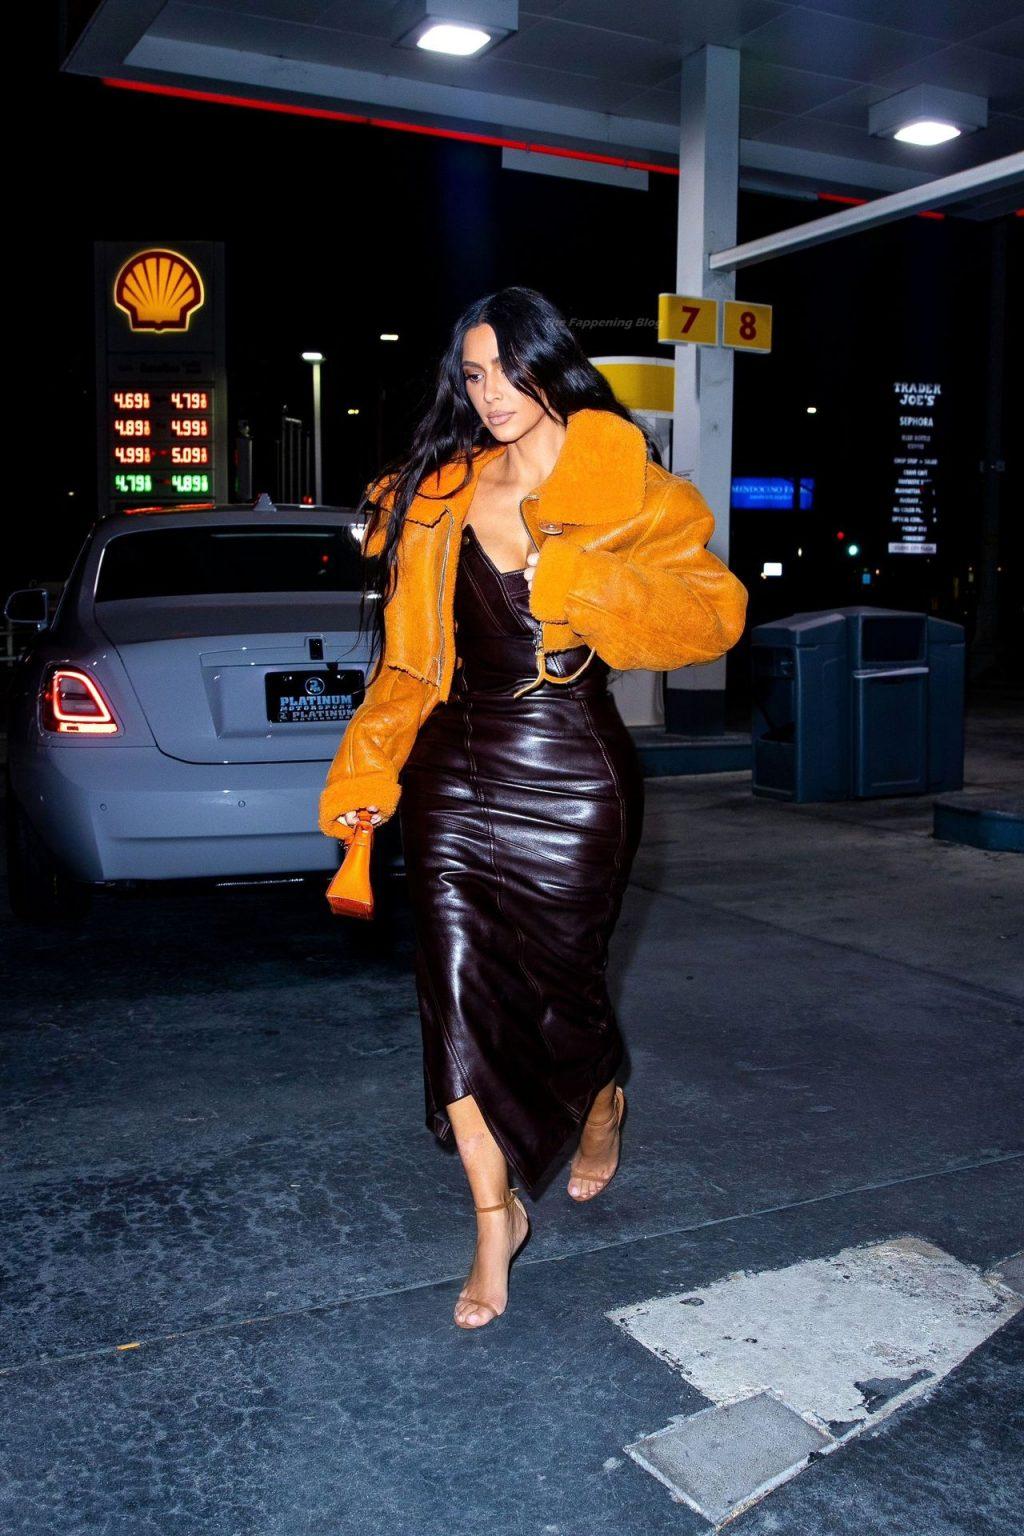 Busty Kim Kardashian is Seen in Los Angeles (11 Photos)